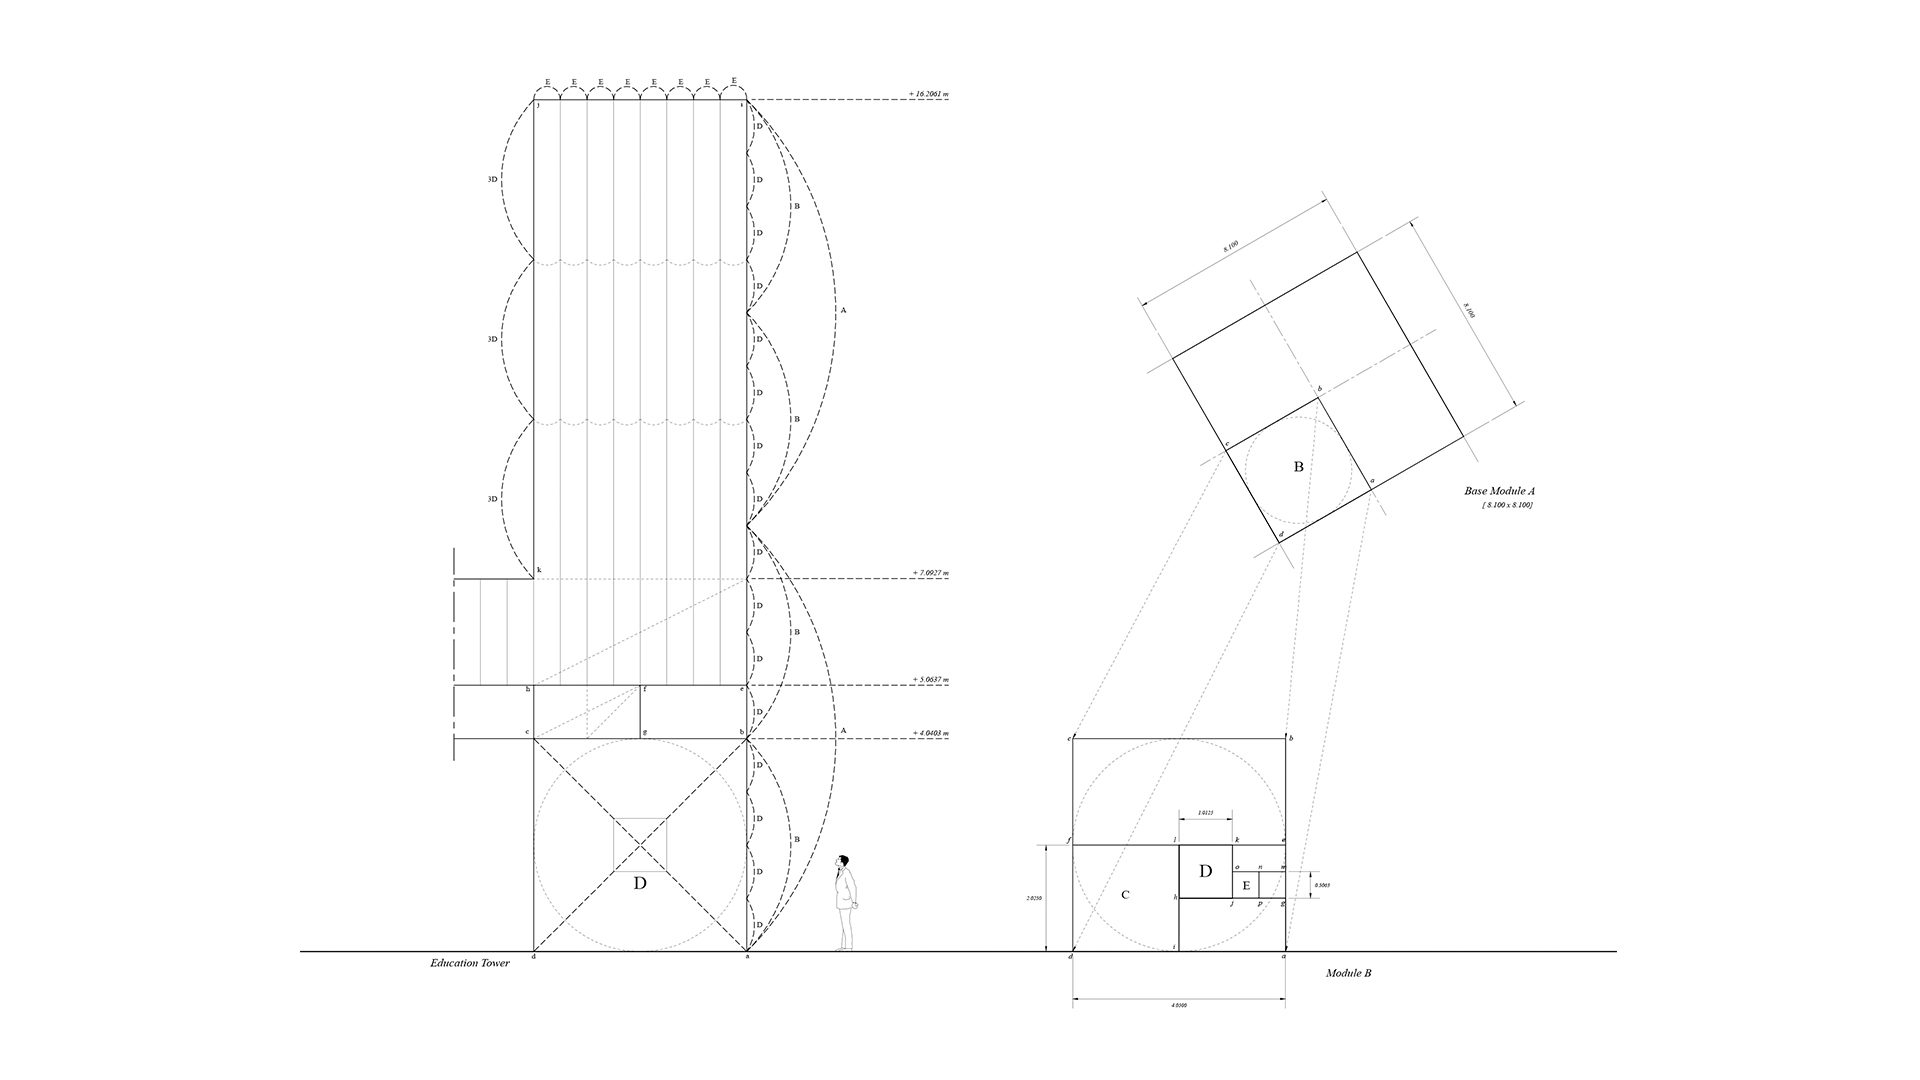 DWG_Modulation Diagram_1920x1080